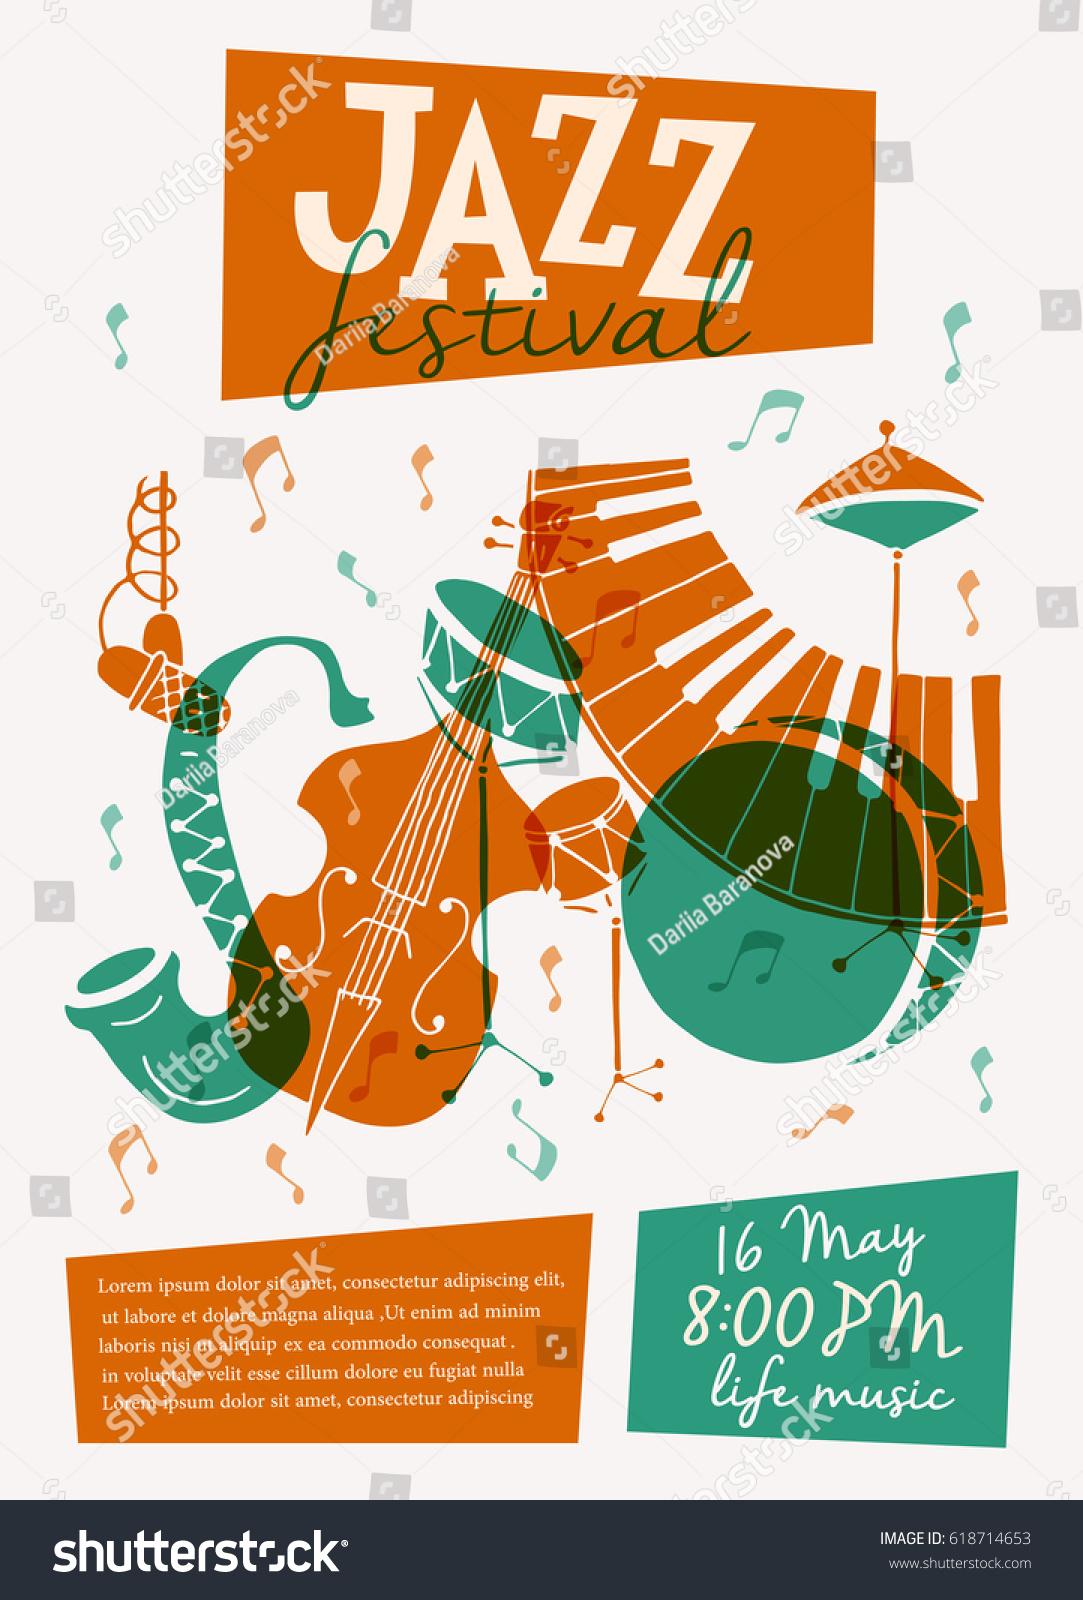 concert press release template - vector jazz festival poster template saxophone stock